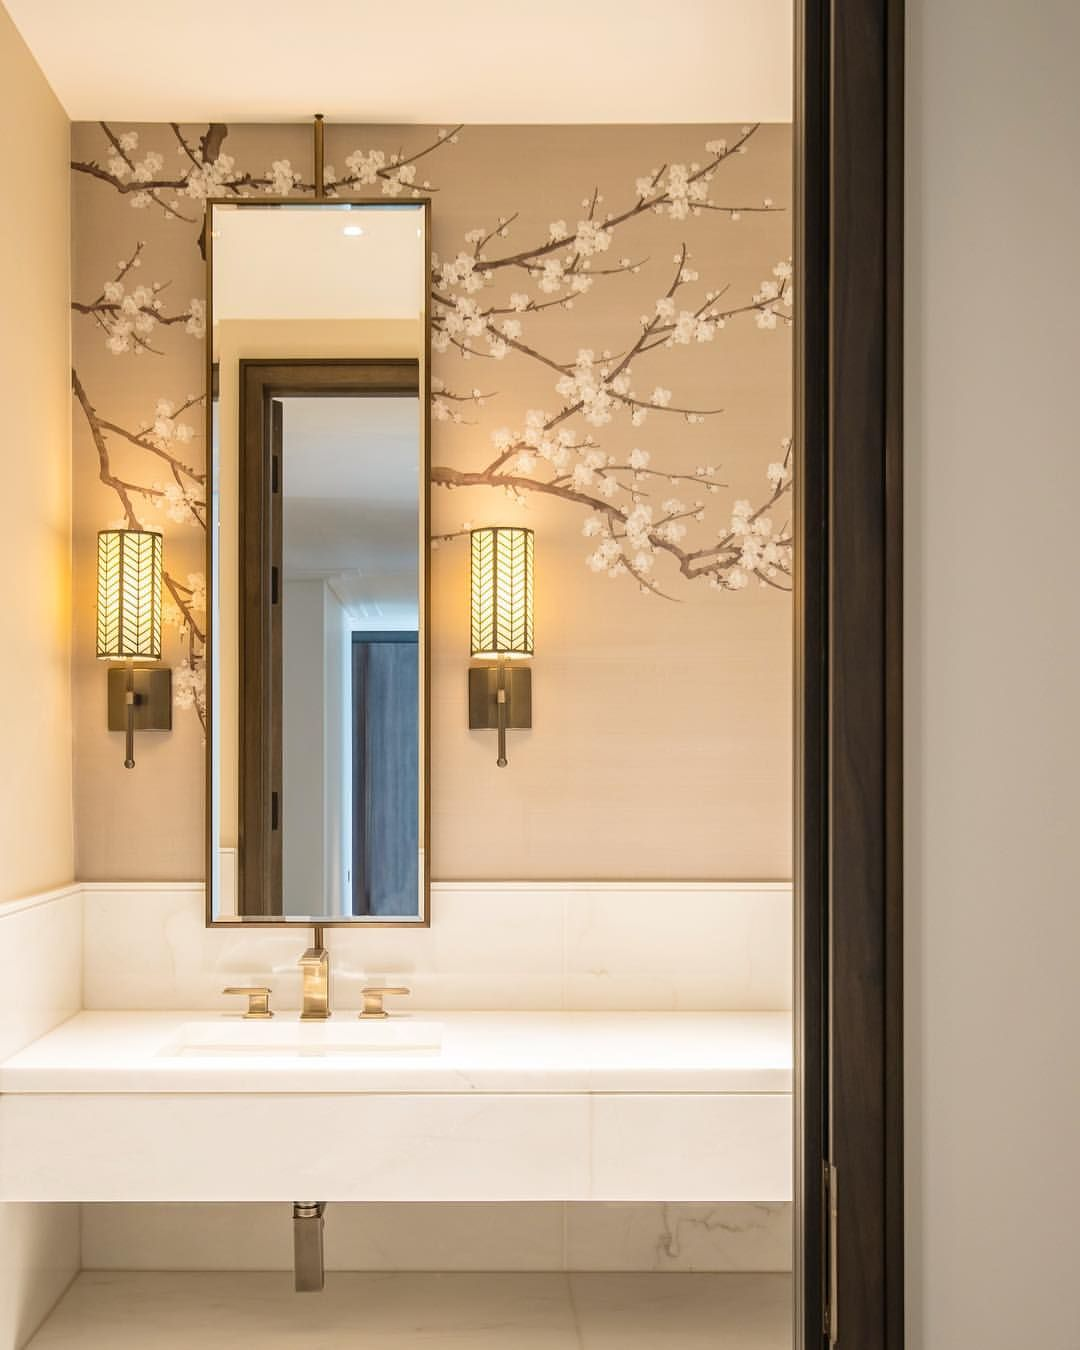 Pin By Gray On Bathroom 4 In 2019 Bathroom Powder Room